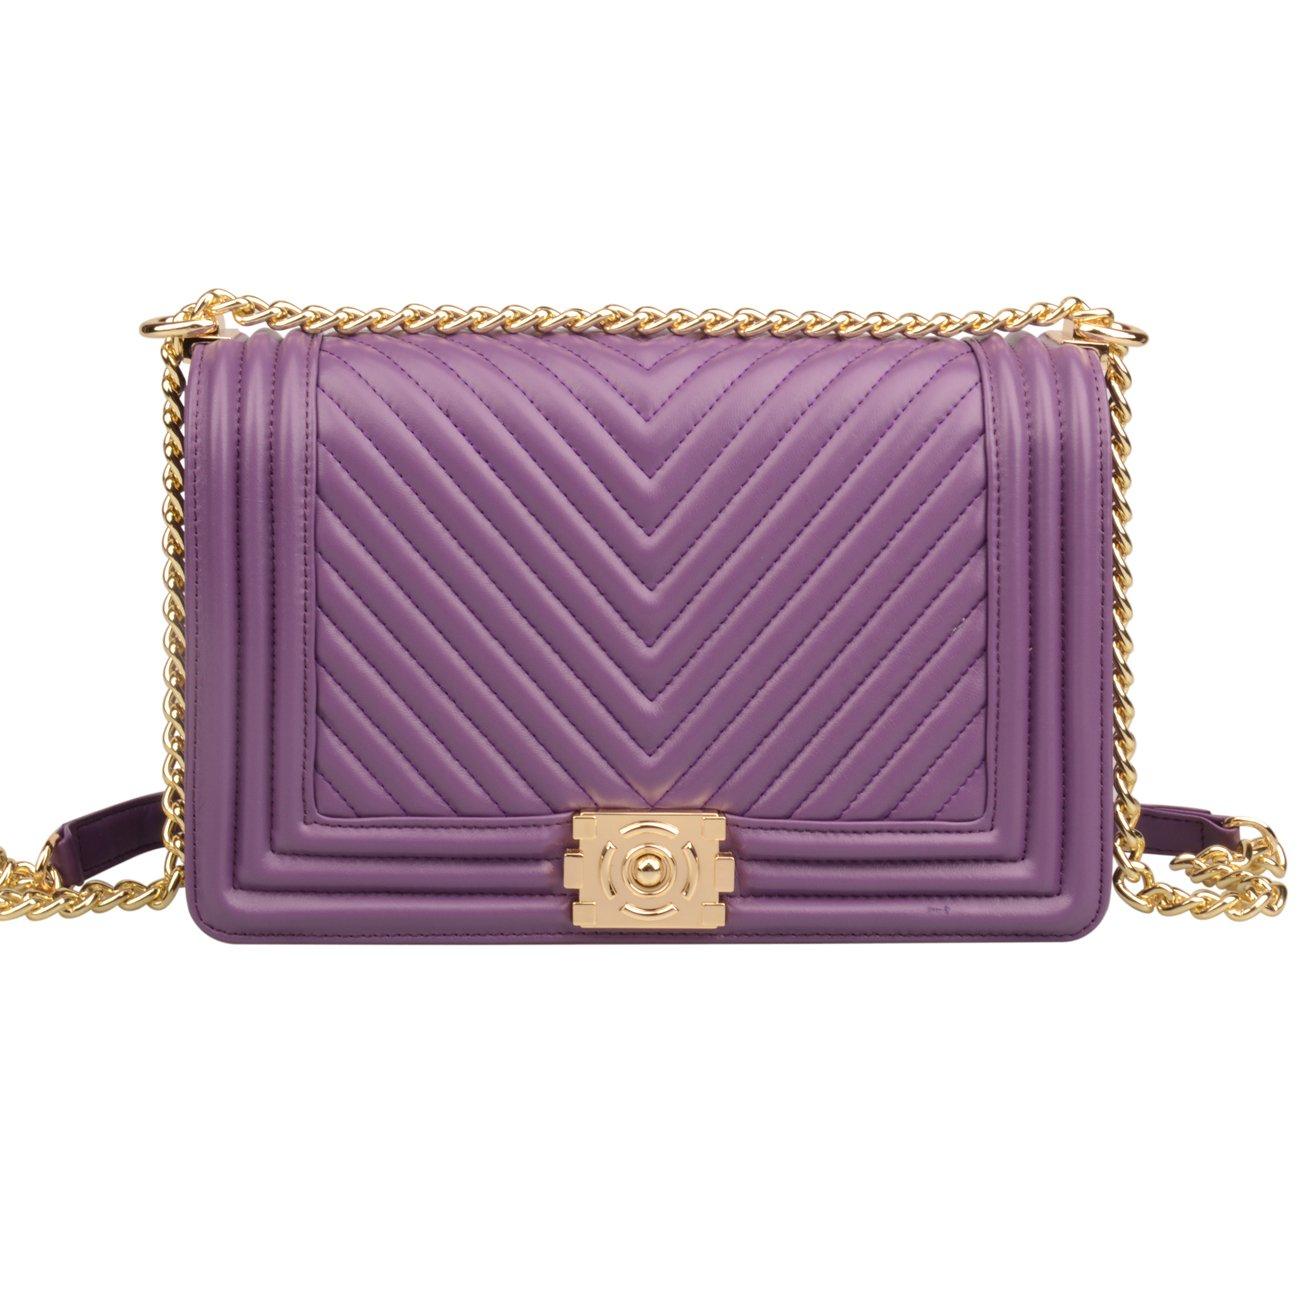 Ainifeel Women's Genuine Leather Quilted Chain Strap Handbags Hobo Bag Crossbody (Large, Purple)